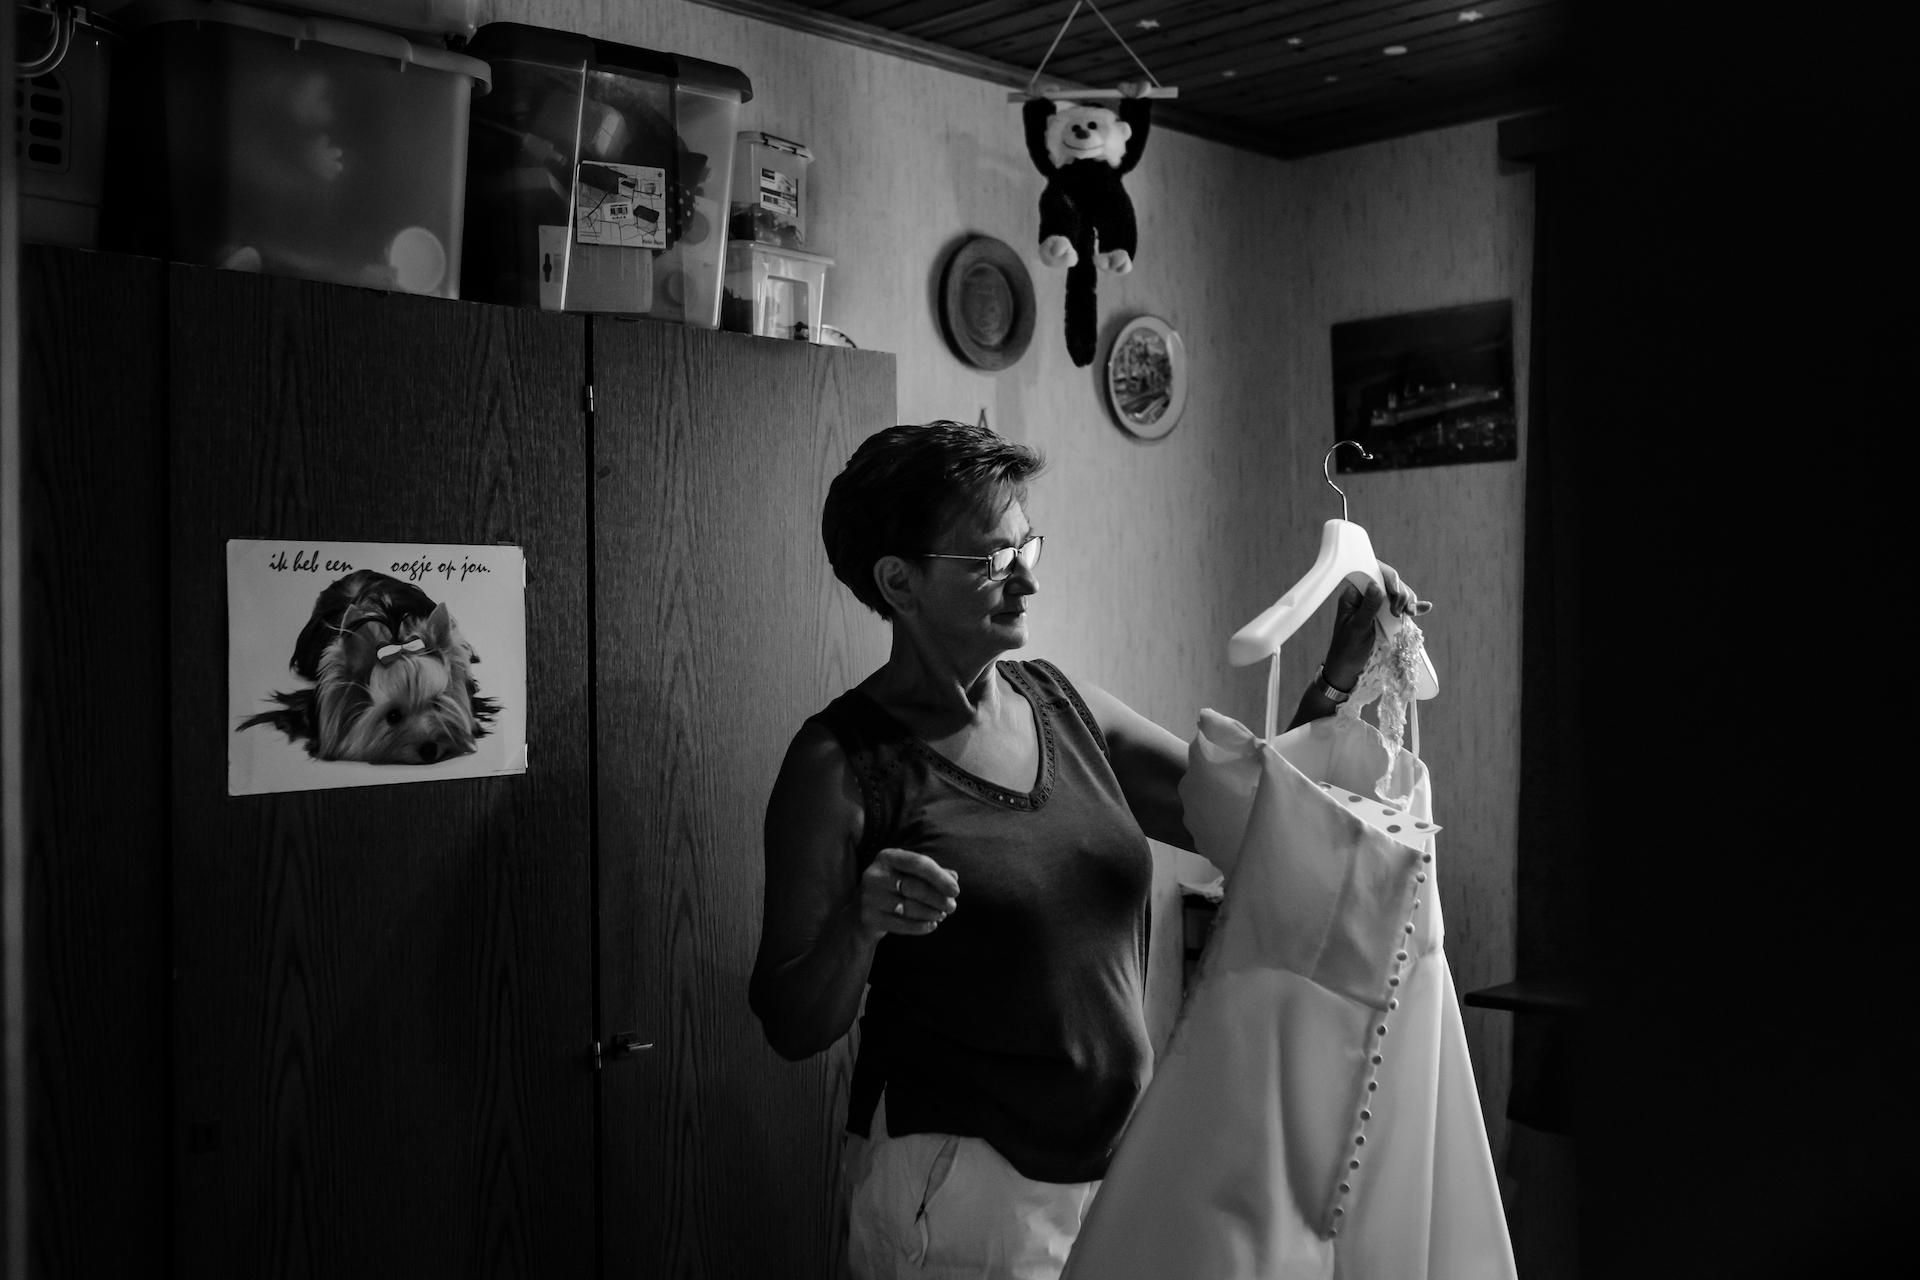 Sint-Truiden, Brussels, Belgium Elopement Photo at Home | The bride's mother retrieves the wedding dress